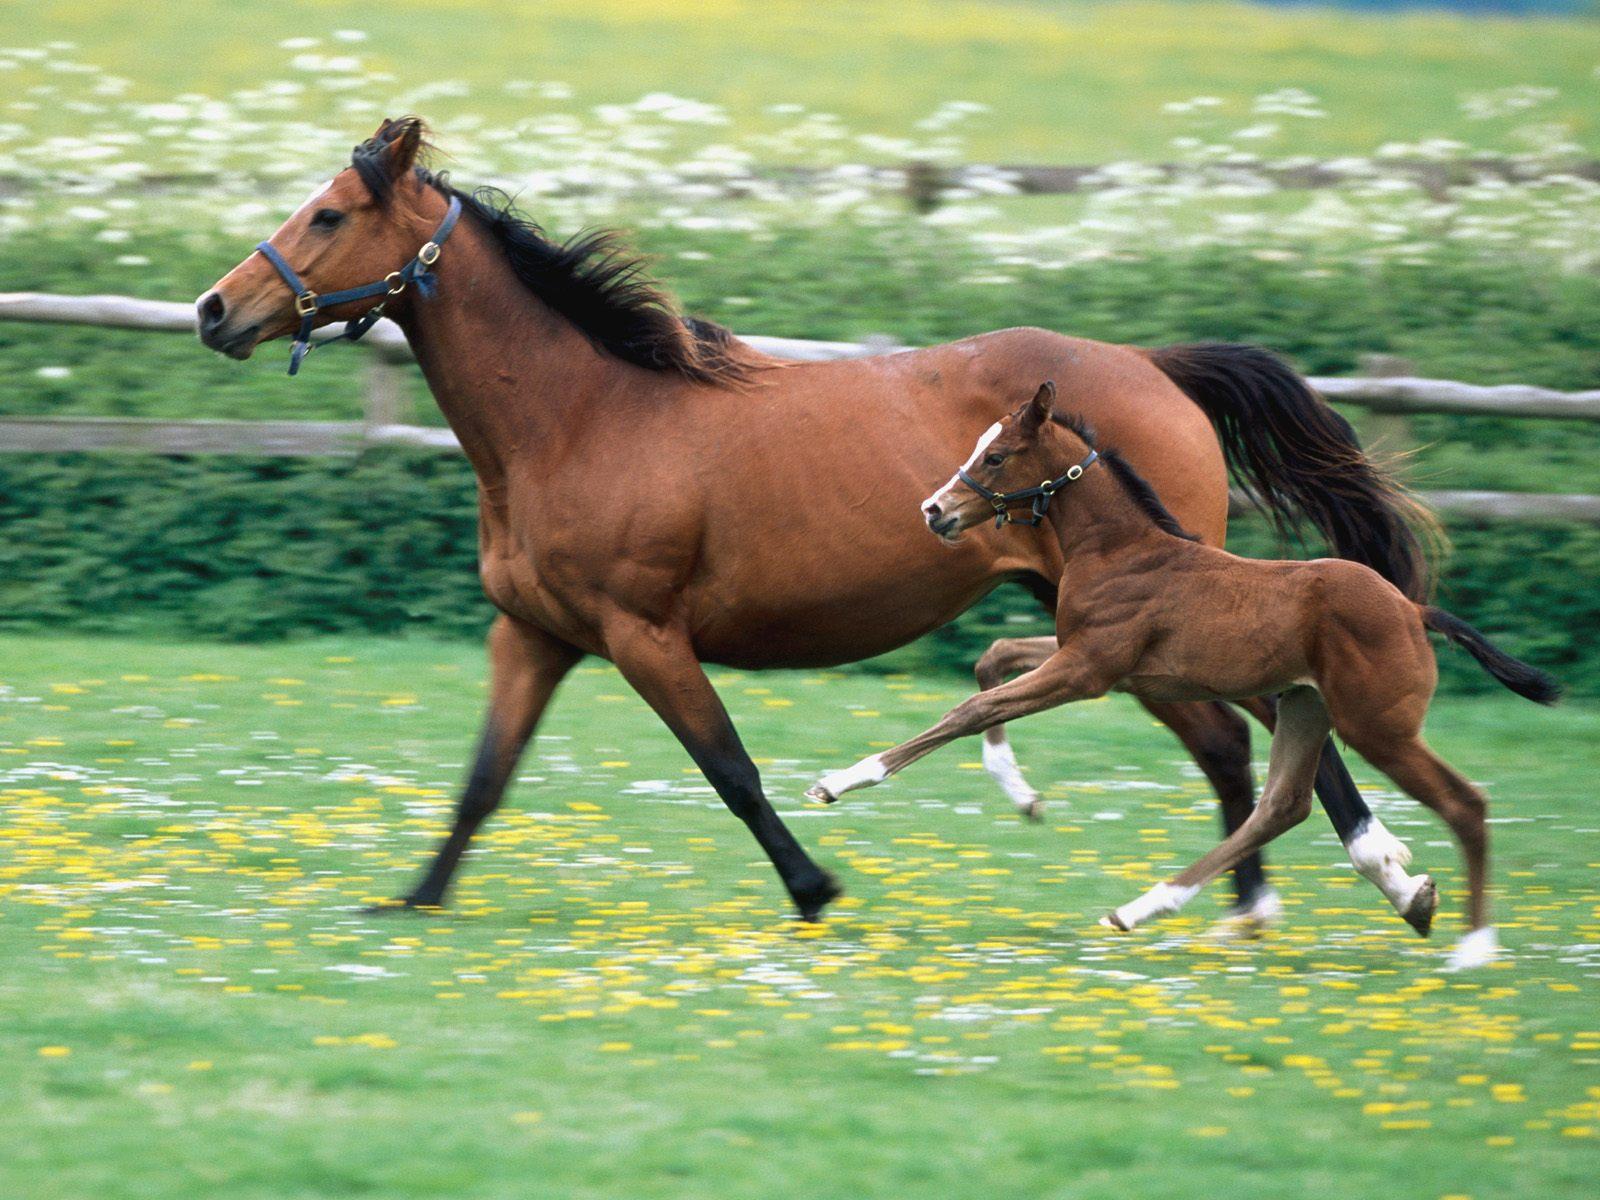 картинки про жеребят и лошадей